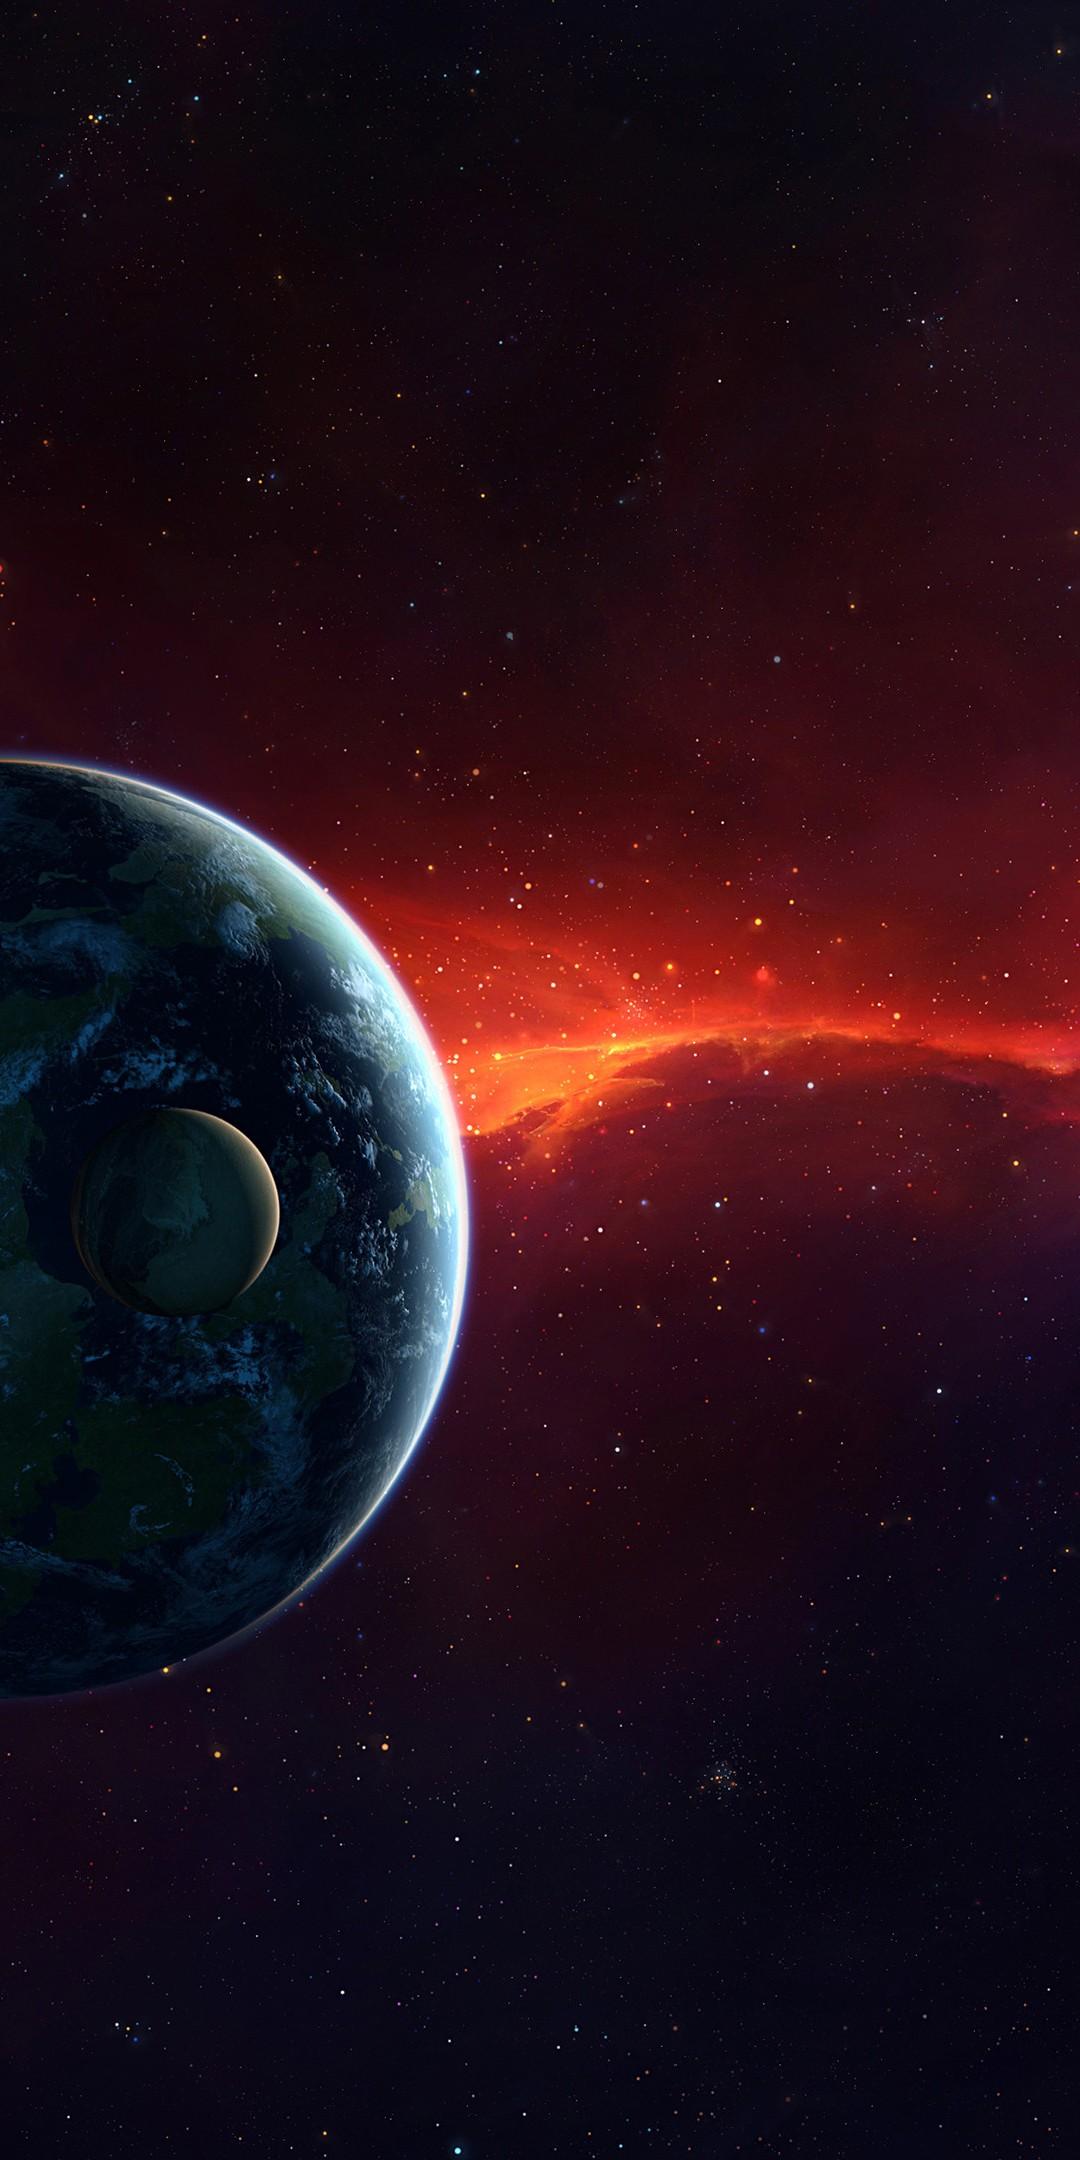 Planets Ultra HD Wallpaper [1080x2160]